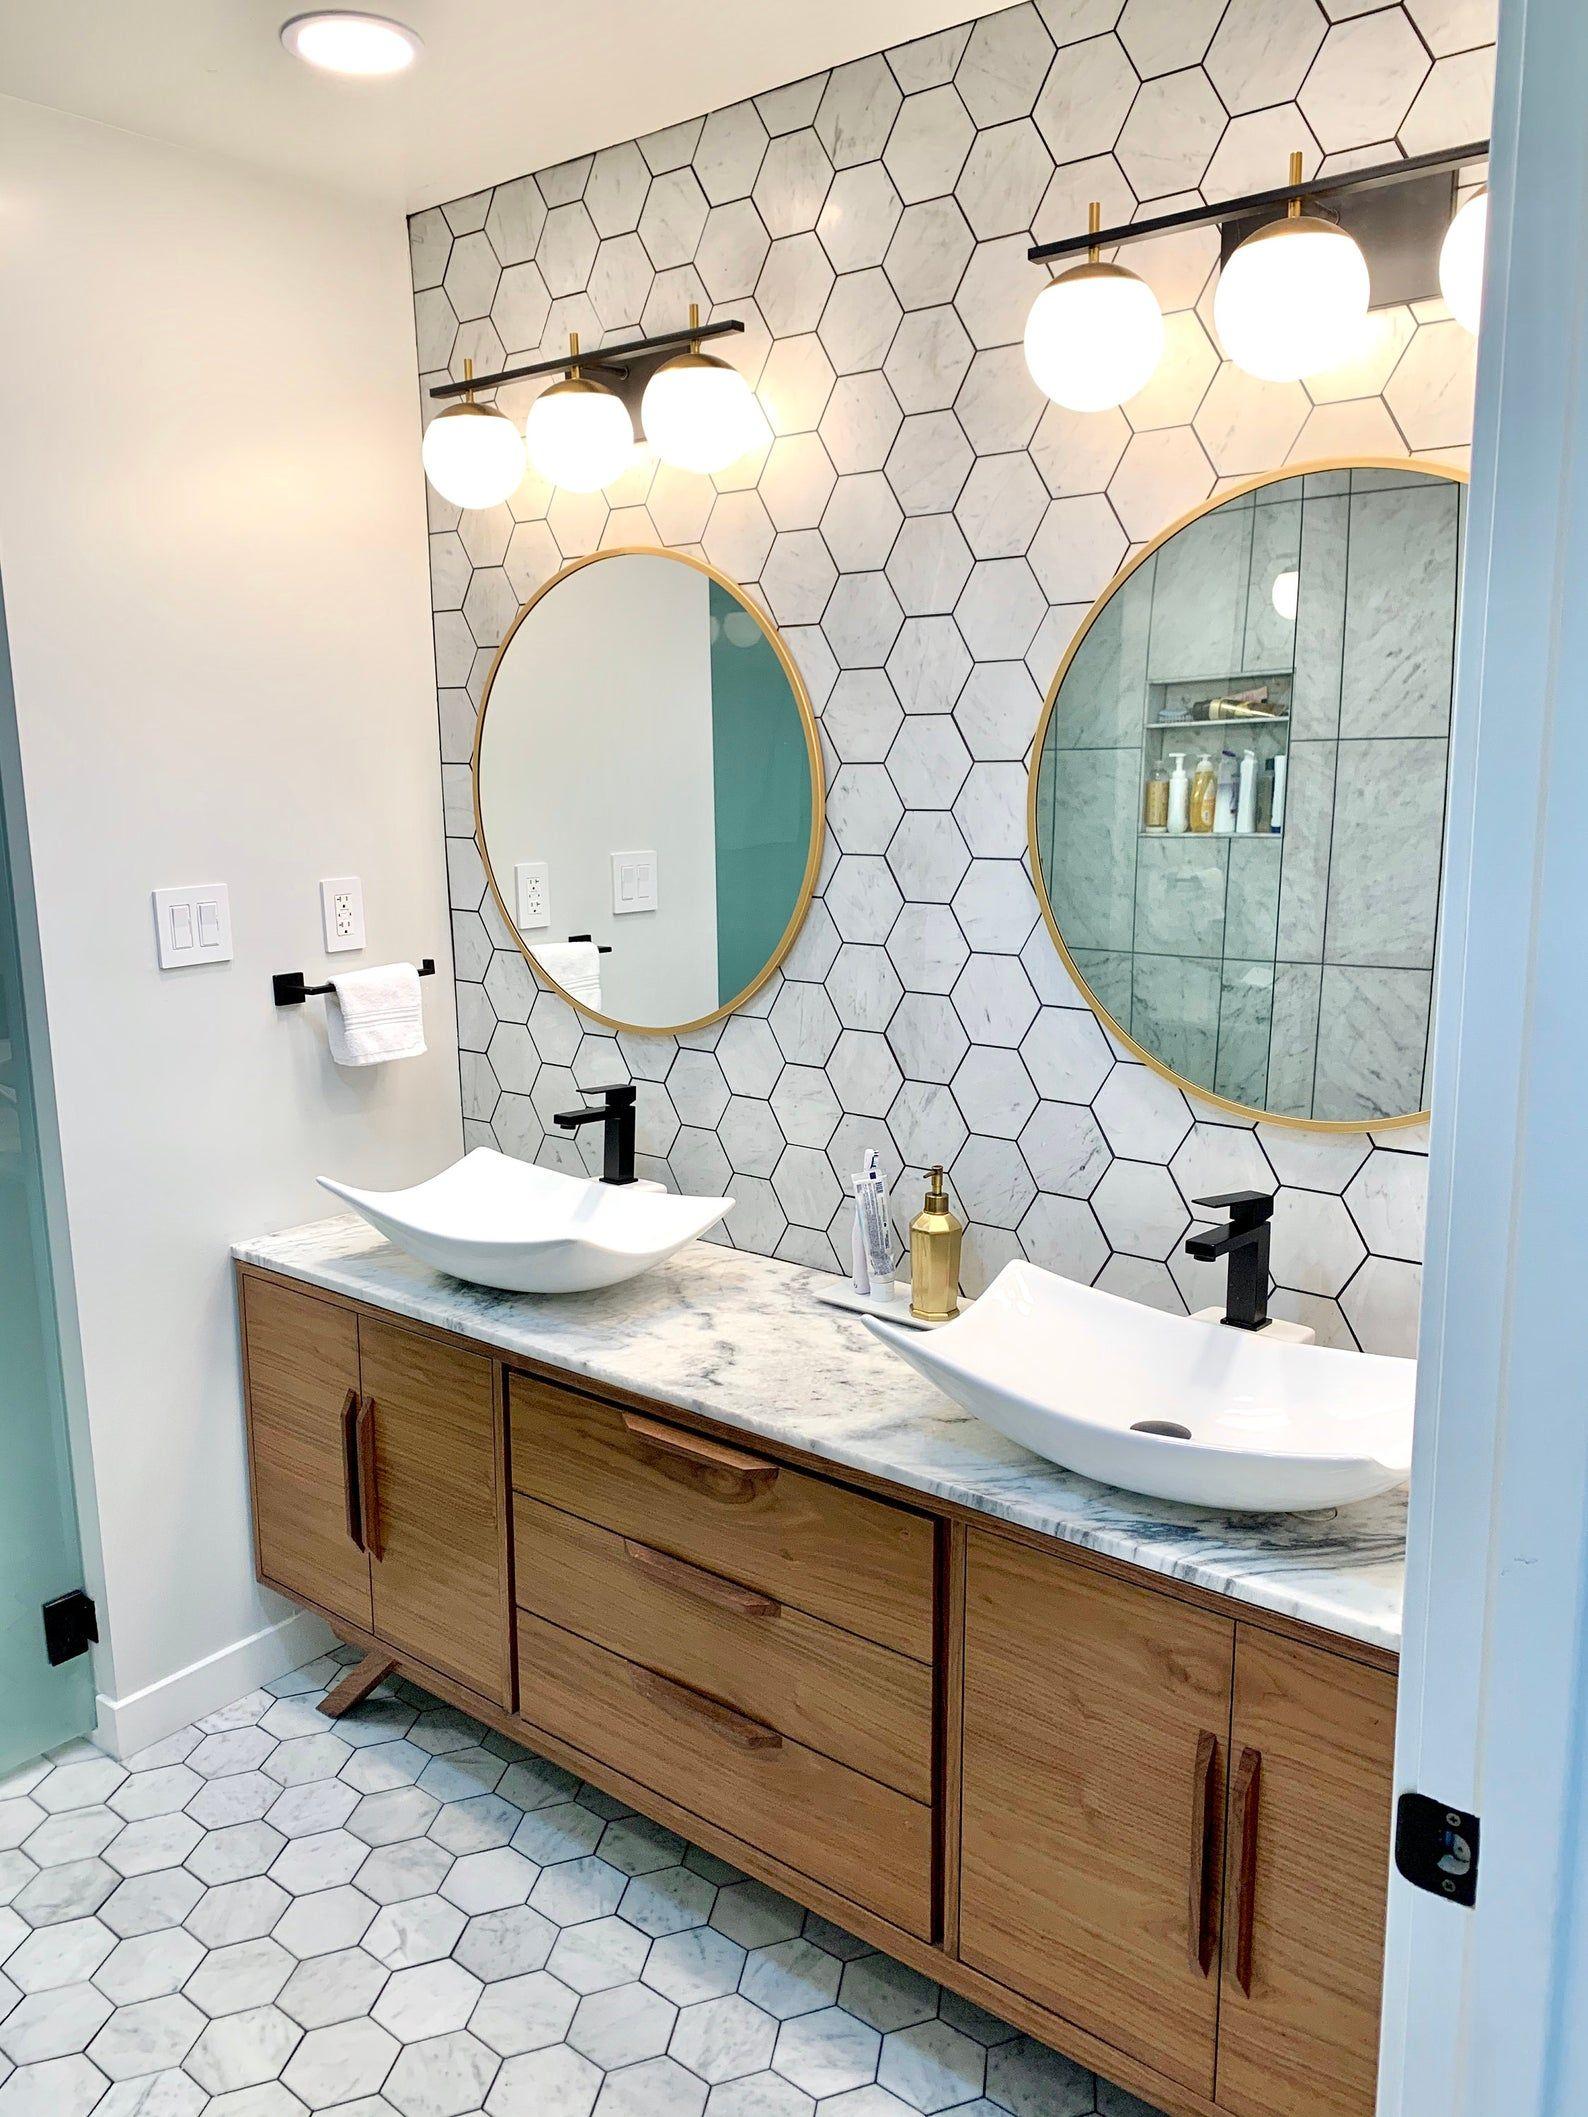 Designing A Tiny Bathroom Modern Bathroom Vanity Mid Century Modern Bathroom Mid Century Bathroom Vanity [ 4928 x 3264 Pixel ]